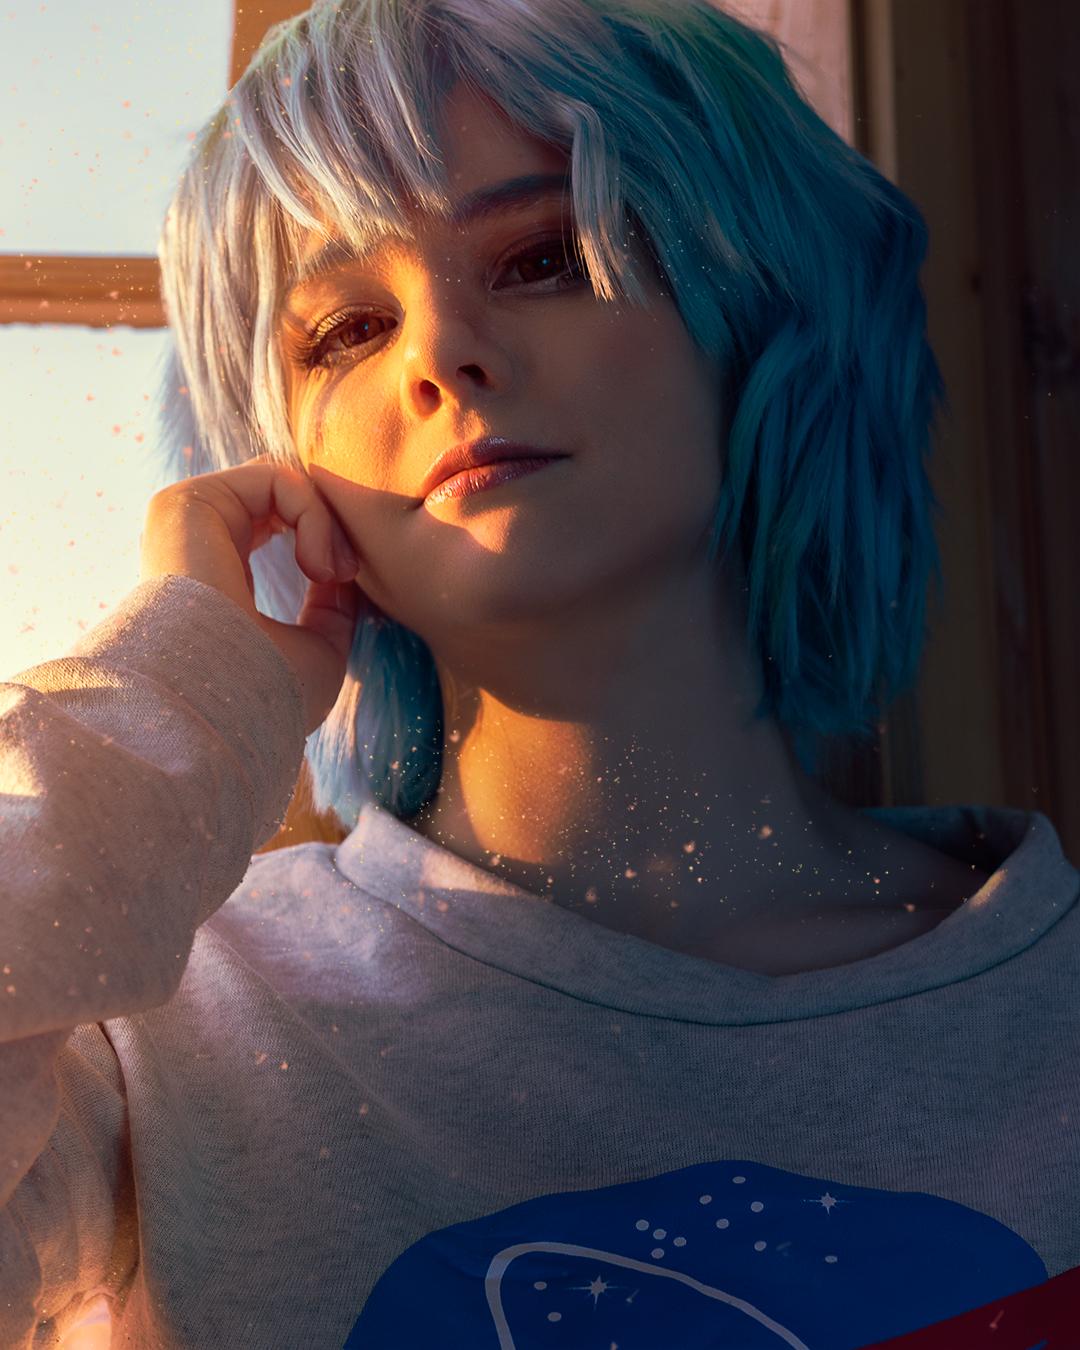 Portrett av earth-chan i en vindusramme. cosplay fotografi ved solnedgang    Portrait of Earth-chan at sunset. sitting in a window frame. closeup portrait. cosplayphotography.